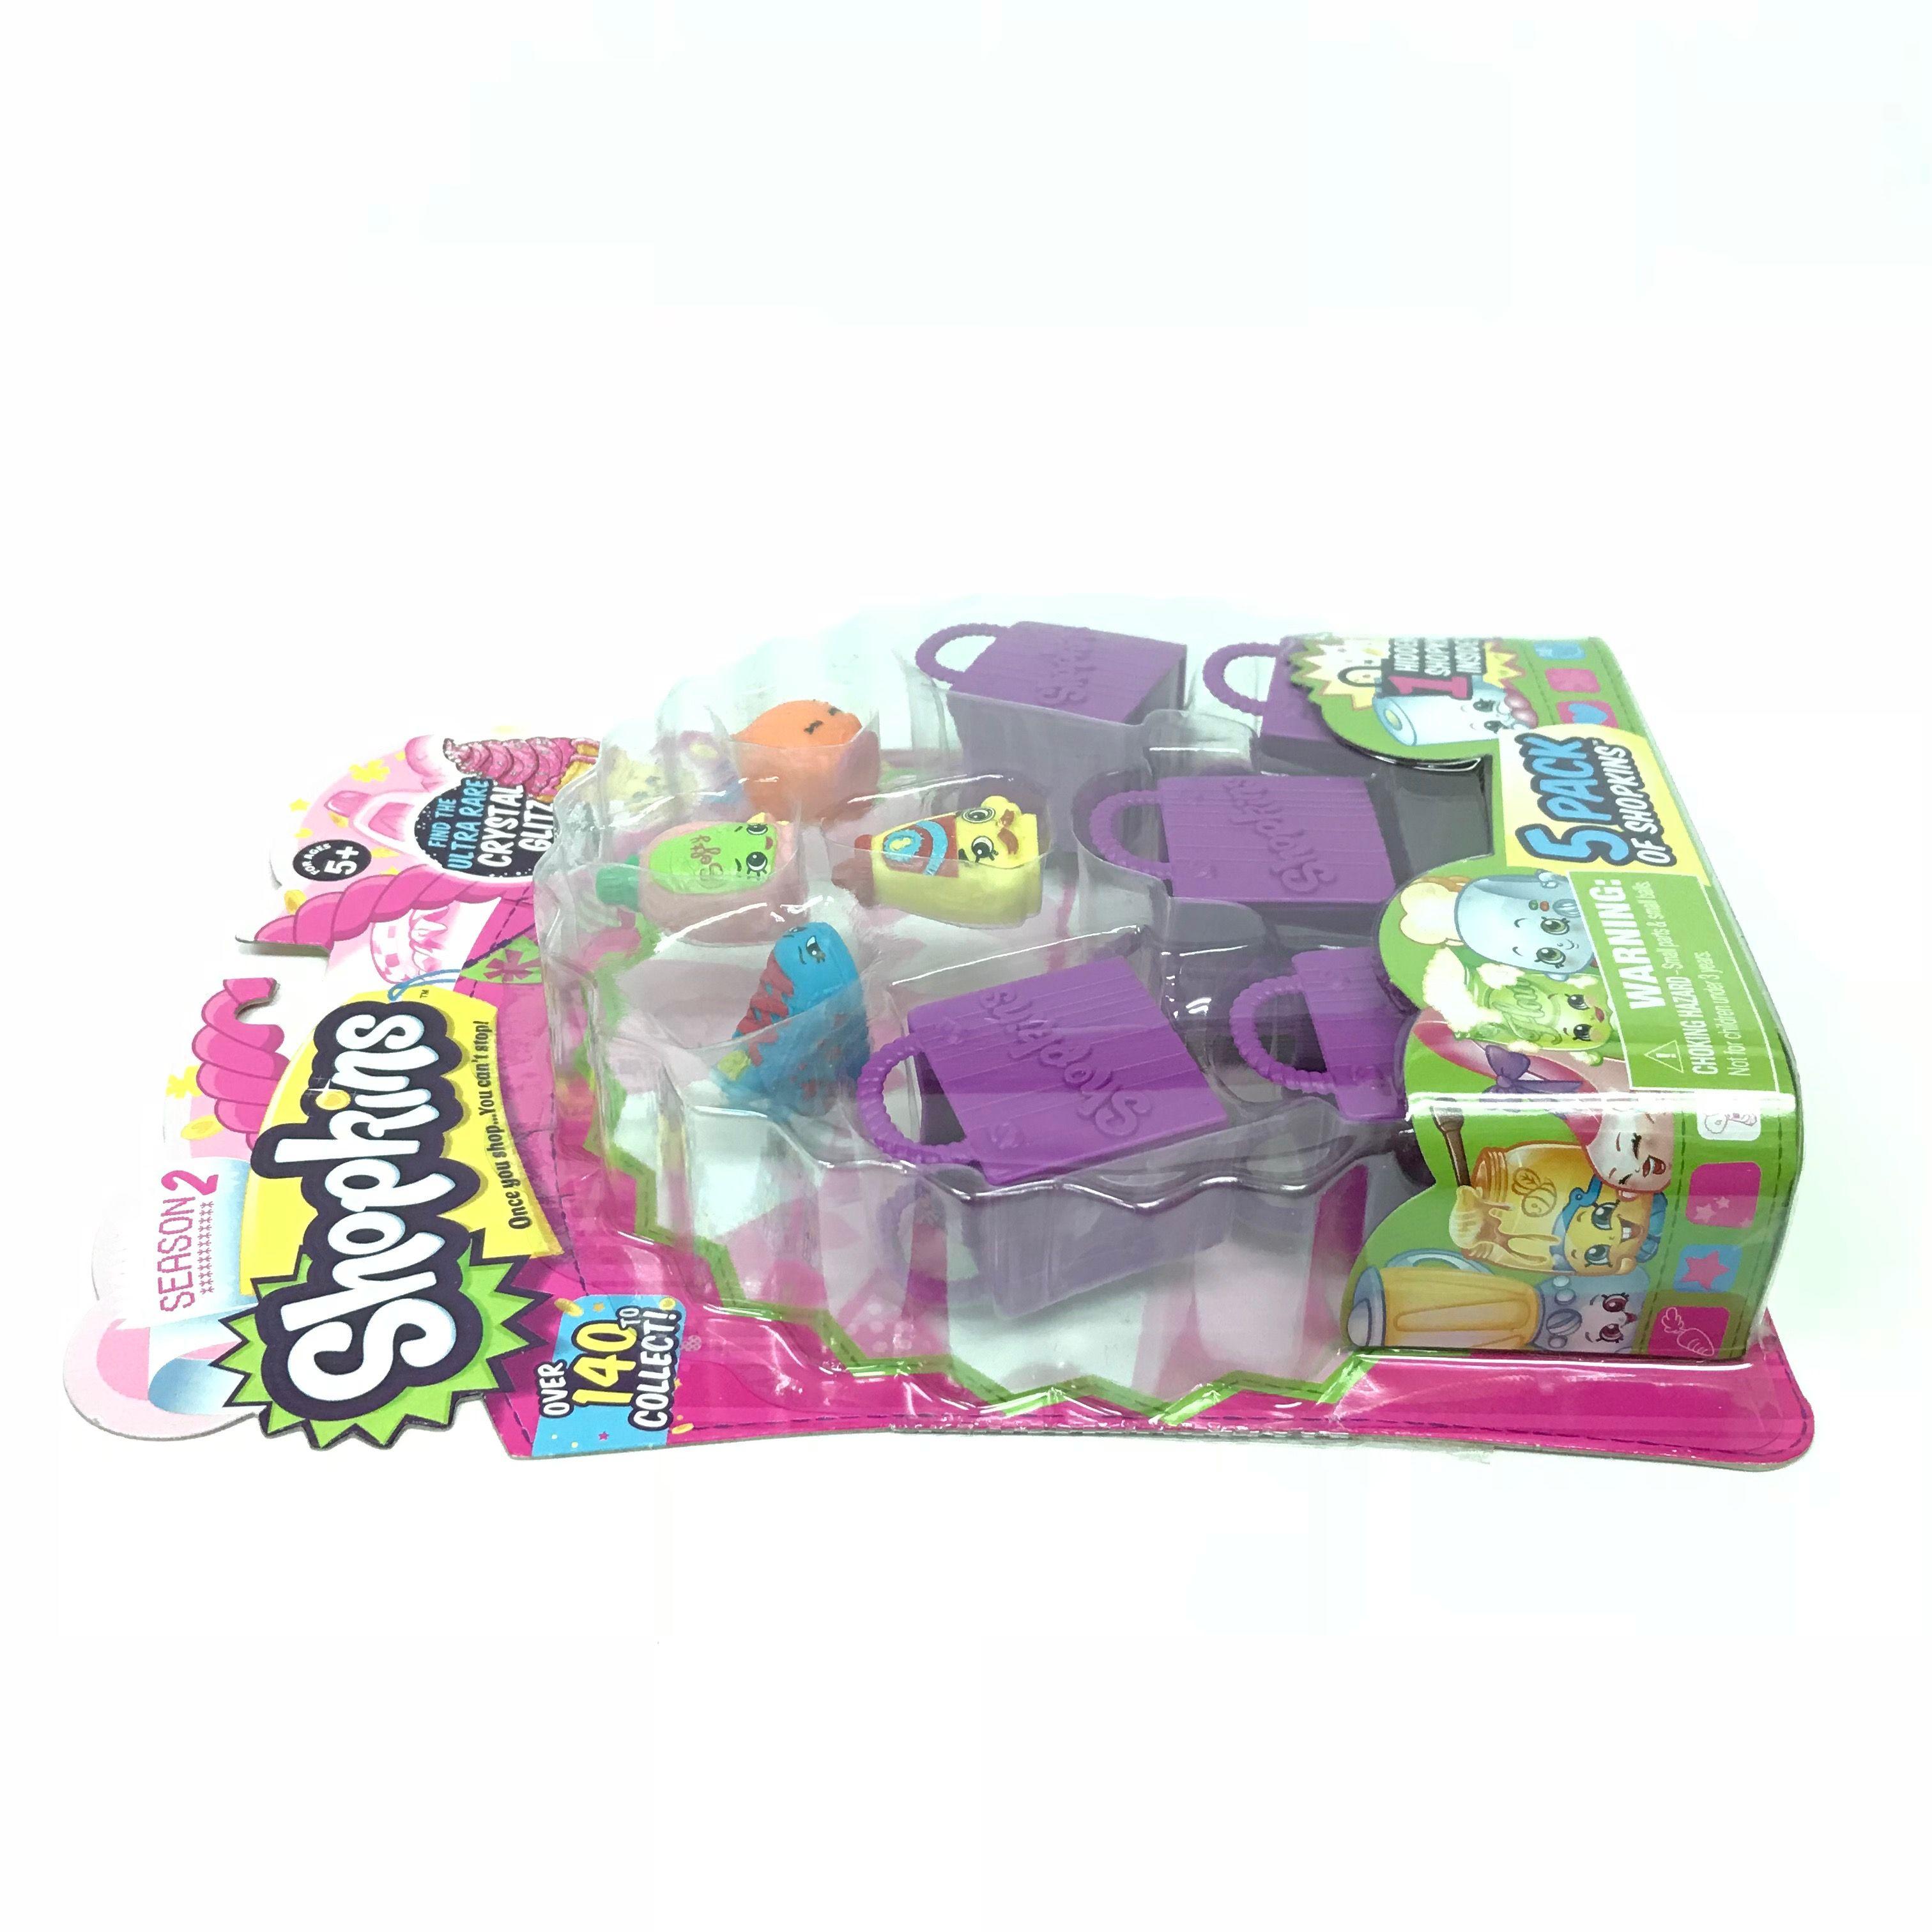 Shopkins-Season-2-Collectibles-Pack-of-5-Bags-Characters-Set thumbnail 10